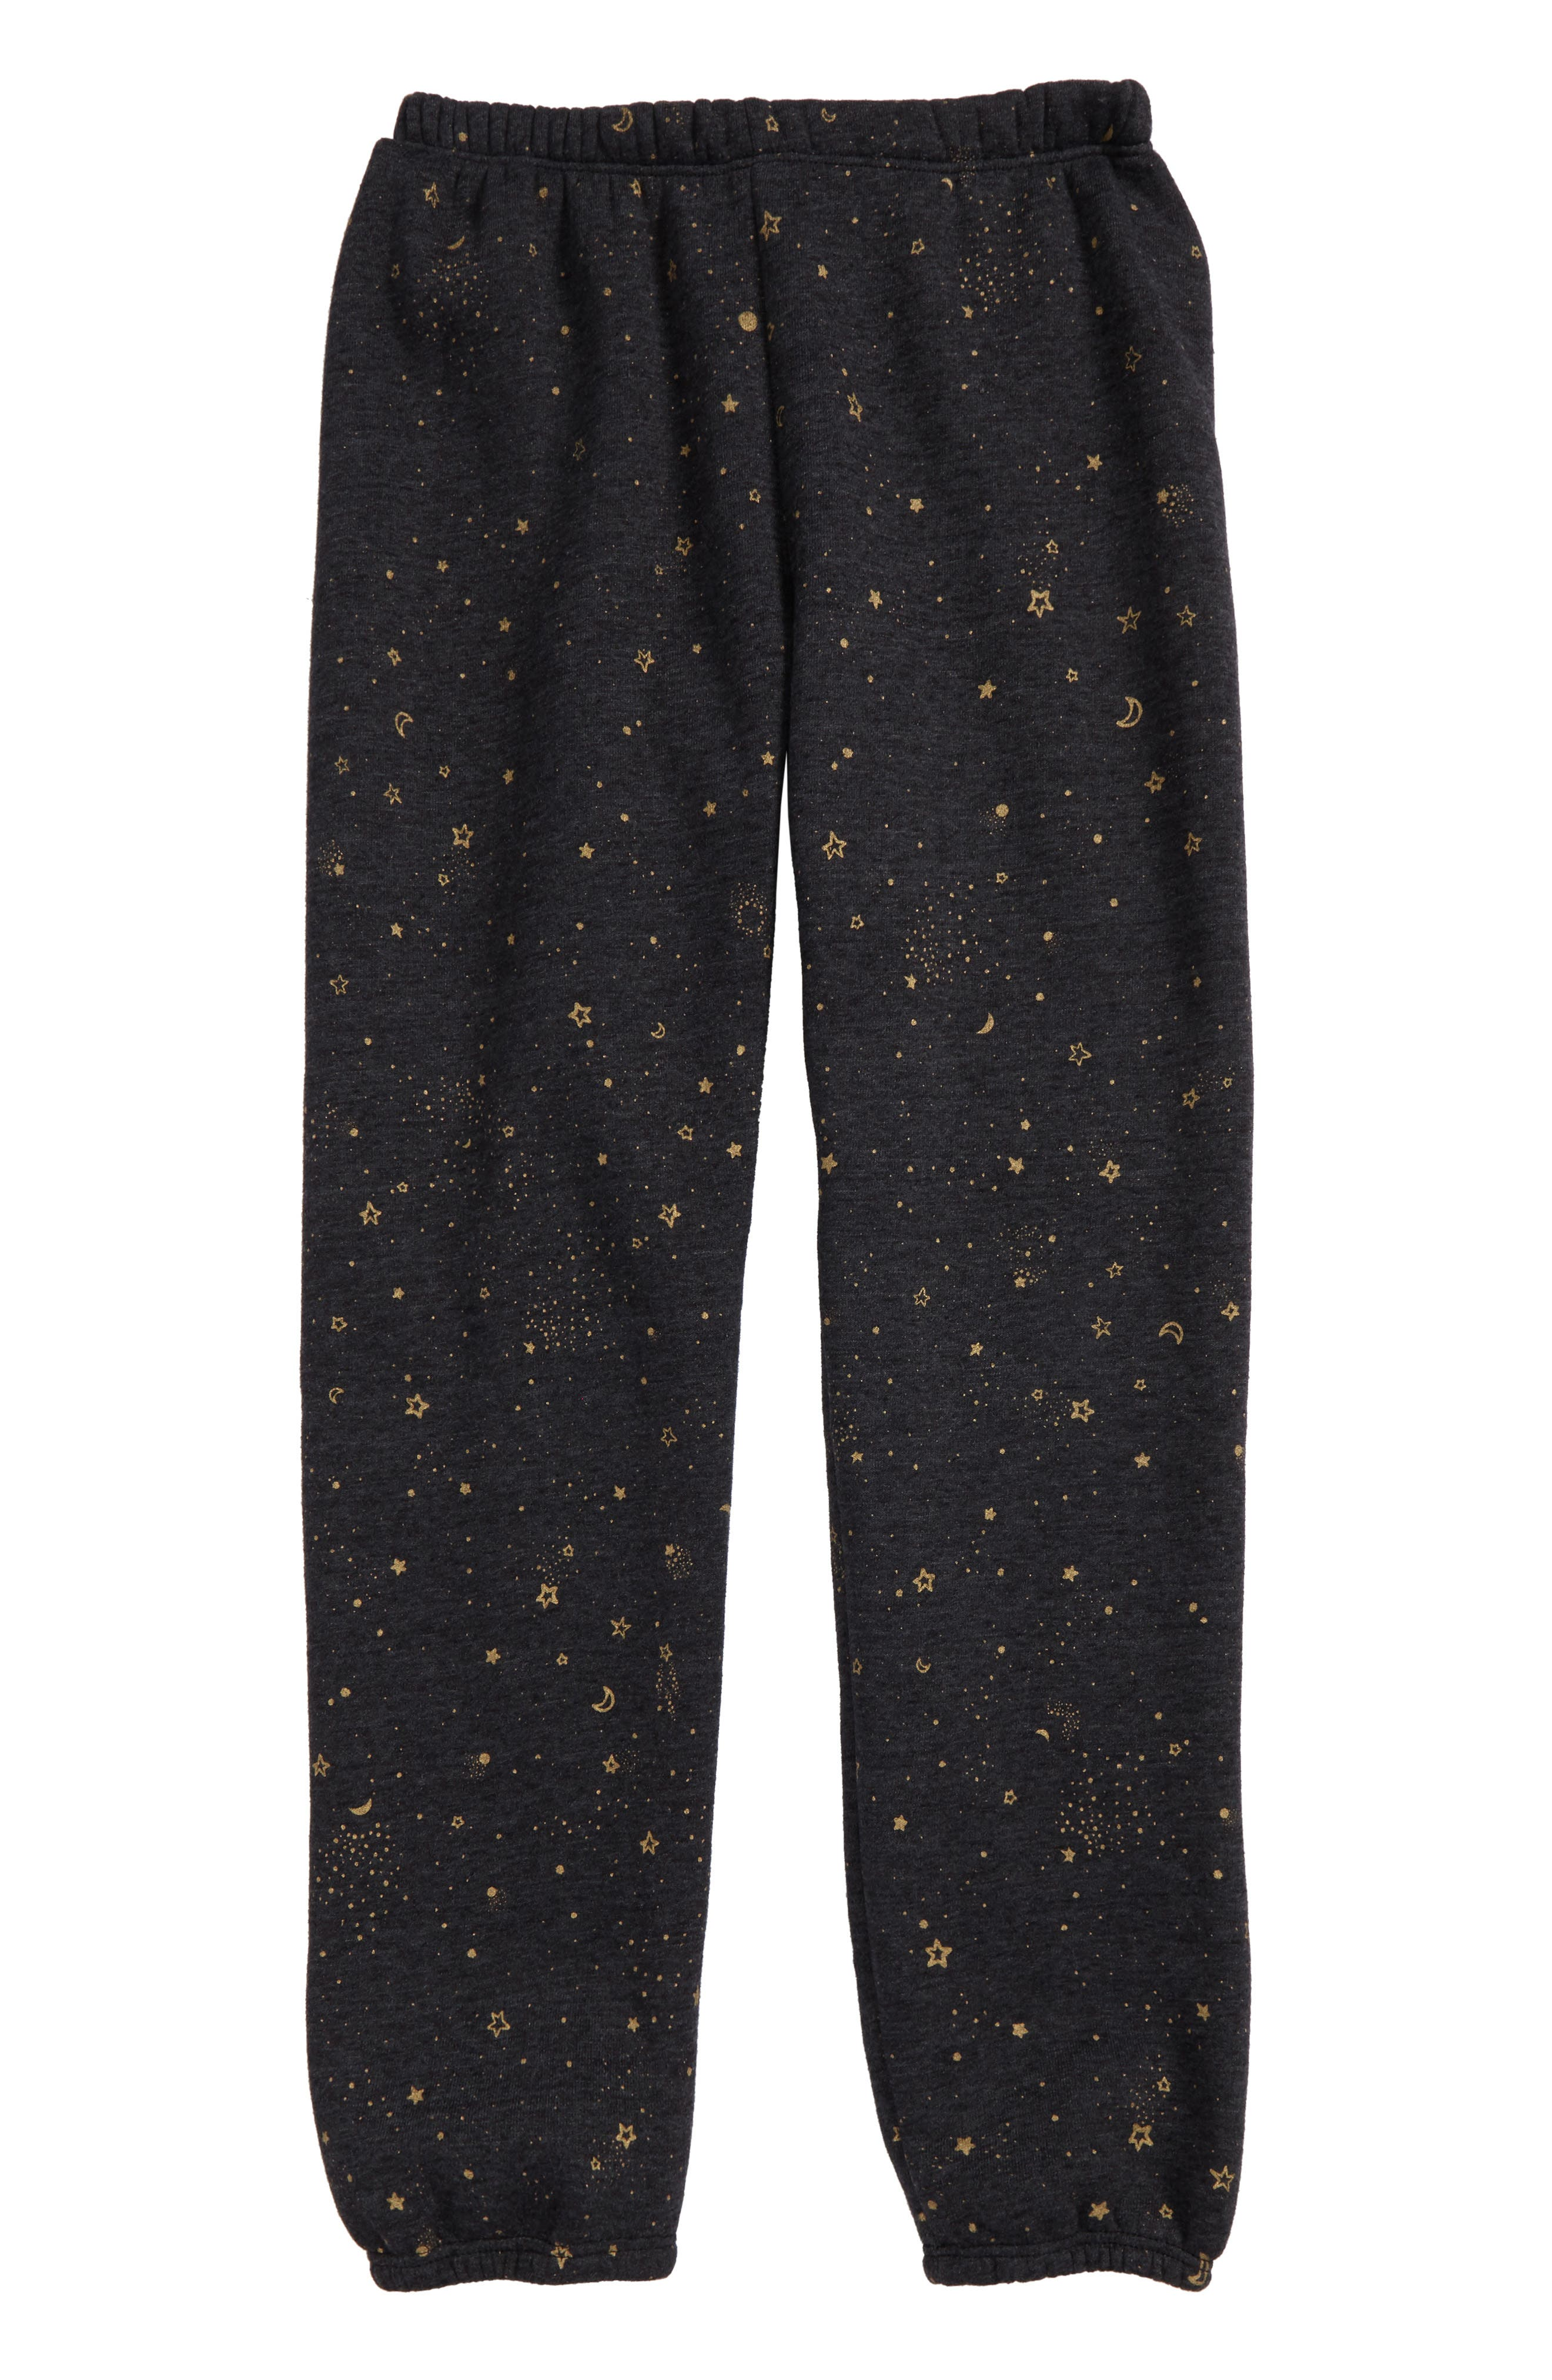 Stellar Print Sweatpants,                         Main,                         color, Vintage Black